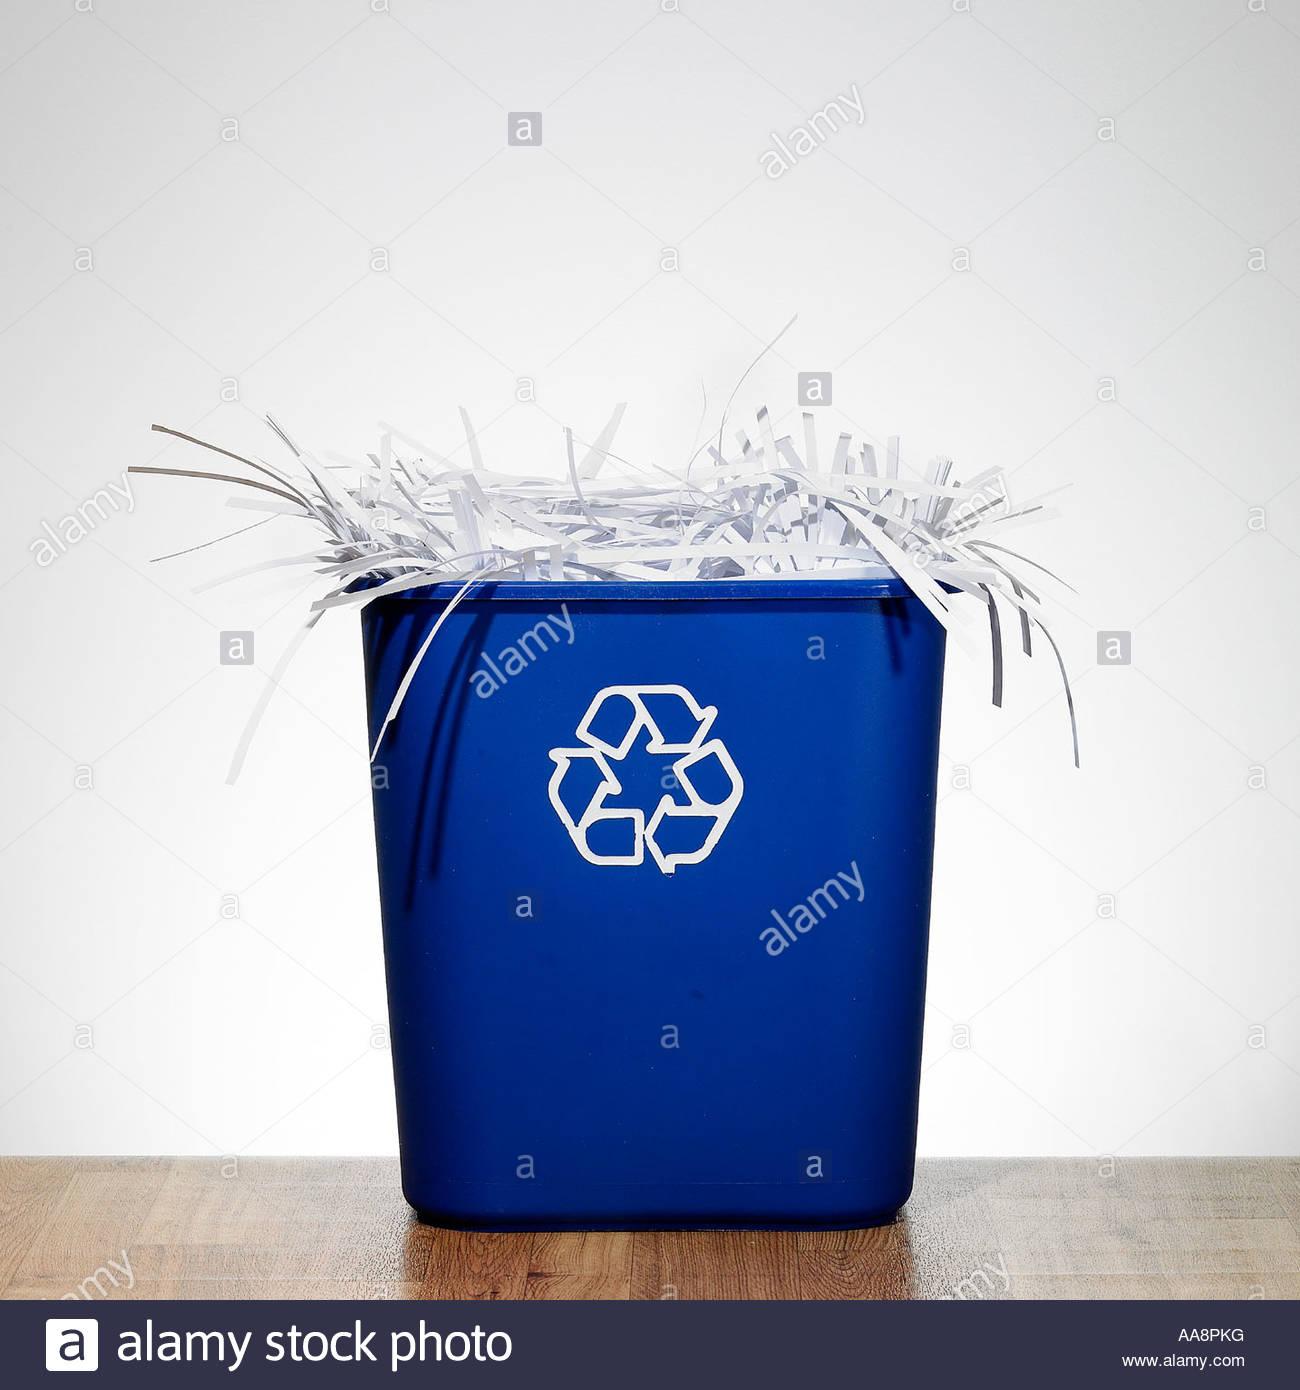 Shredded paper in blue bin